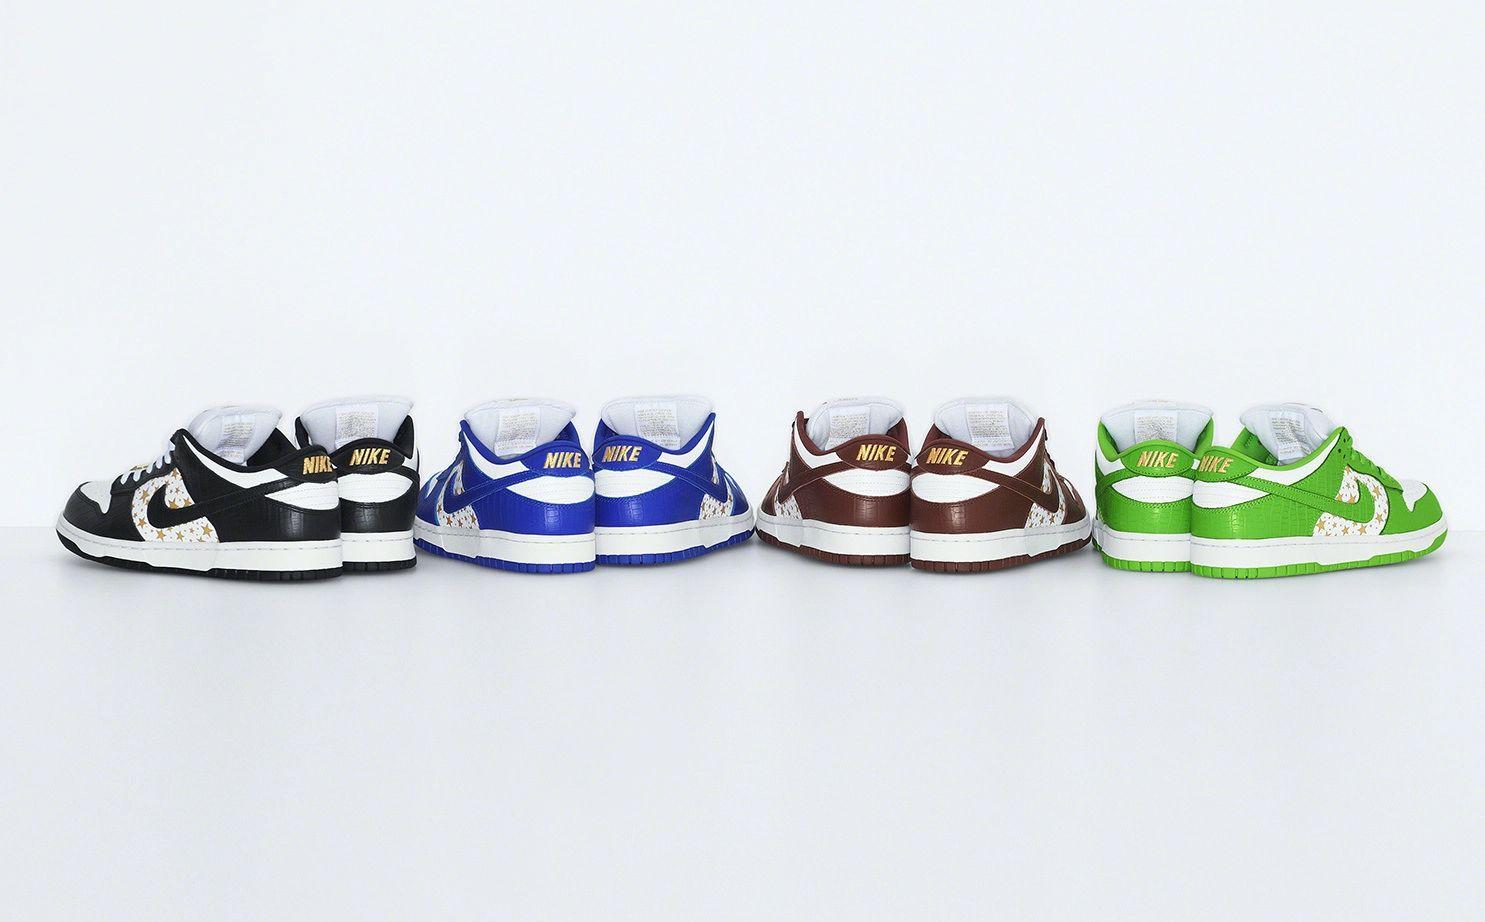 Supreme Nike SB Dunk Low Release Date